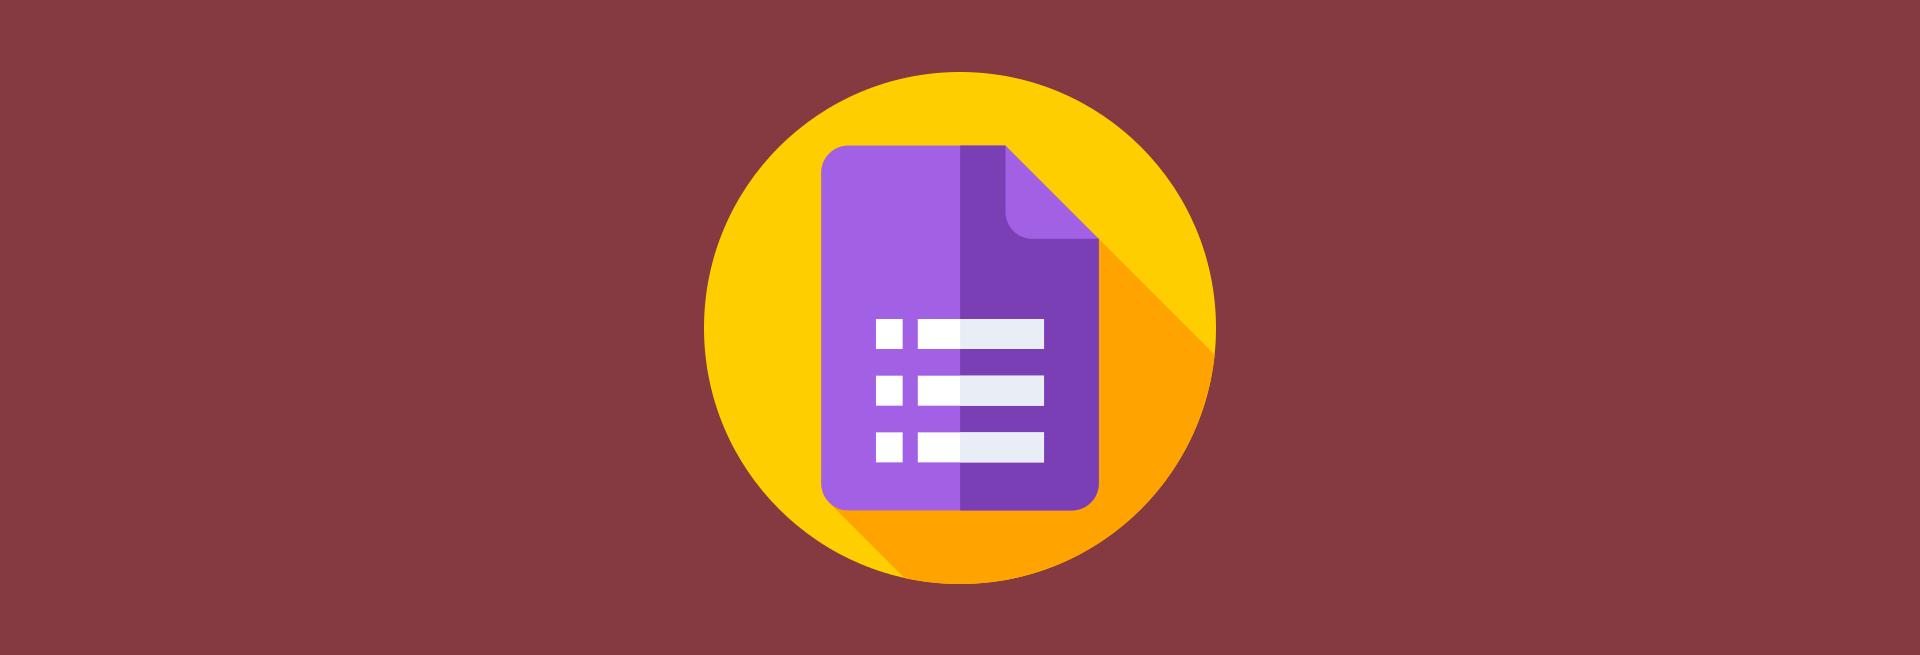 Google-Forms-Alternatives.png